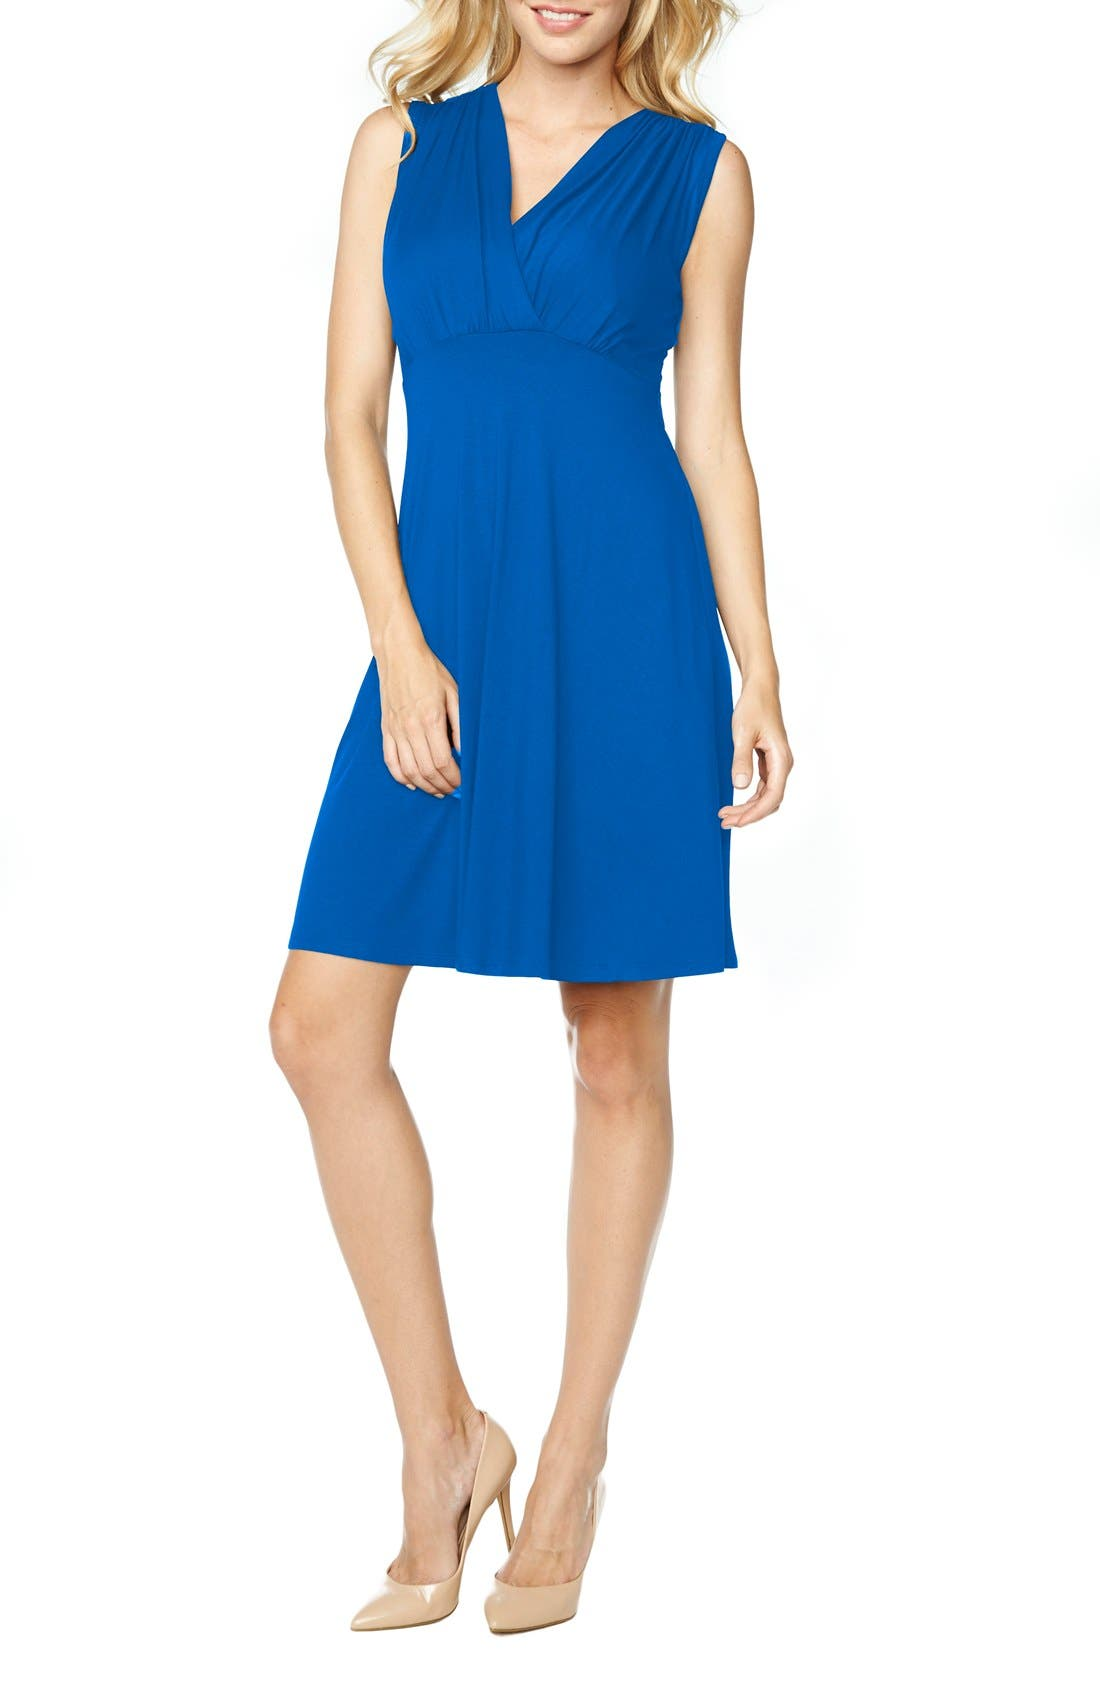 Main Image - Maternal America Tummy Tuck Sleeveless Maternity/Nursing Dress